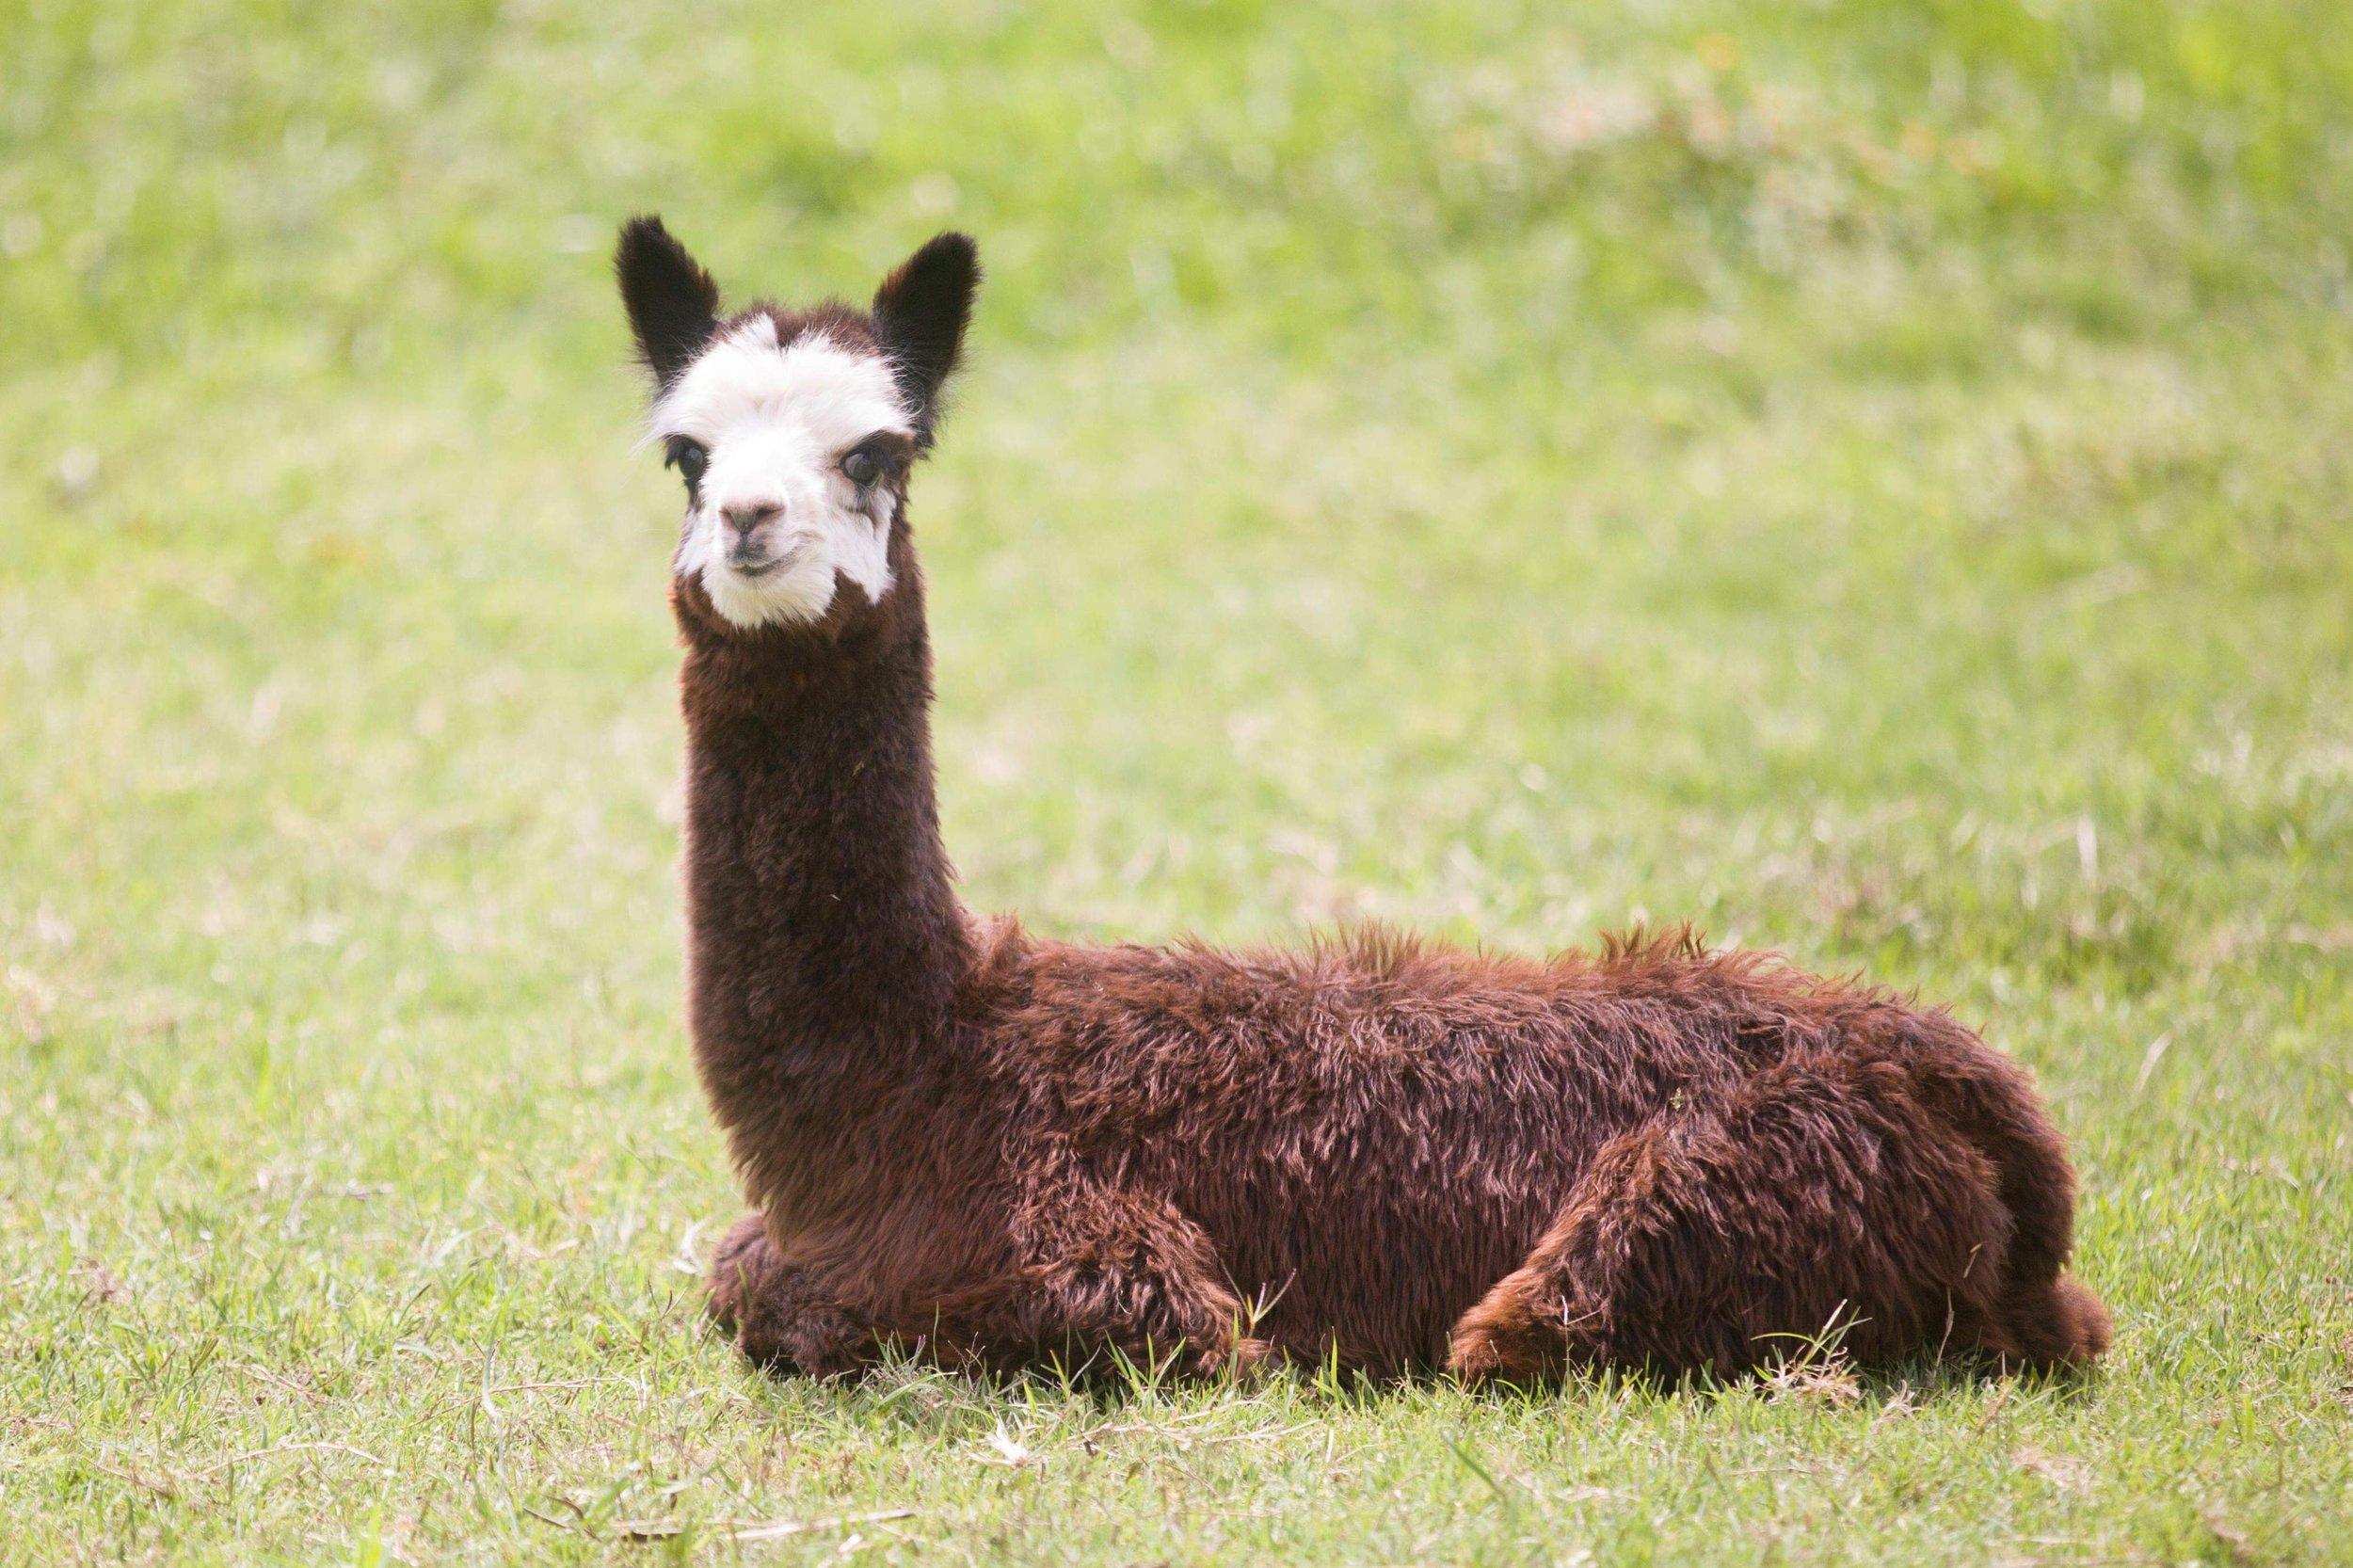 Bandit The Alpaca